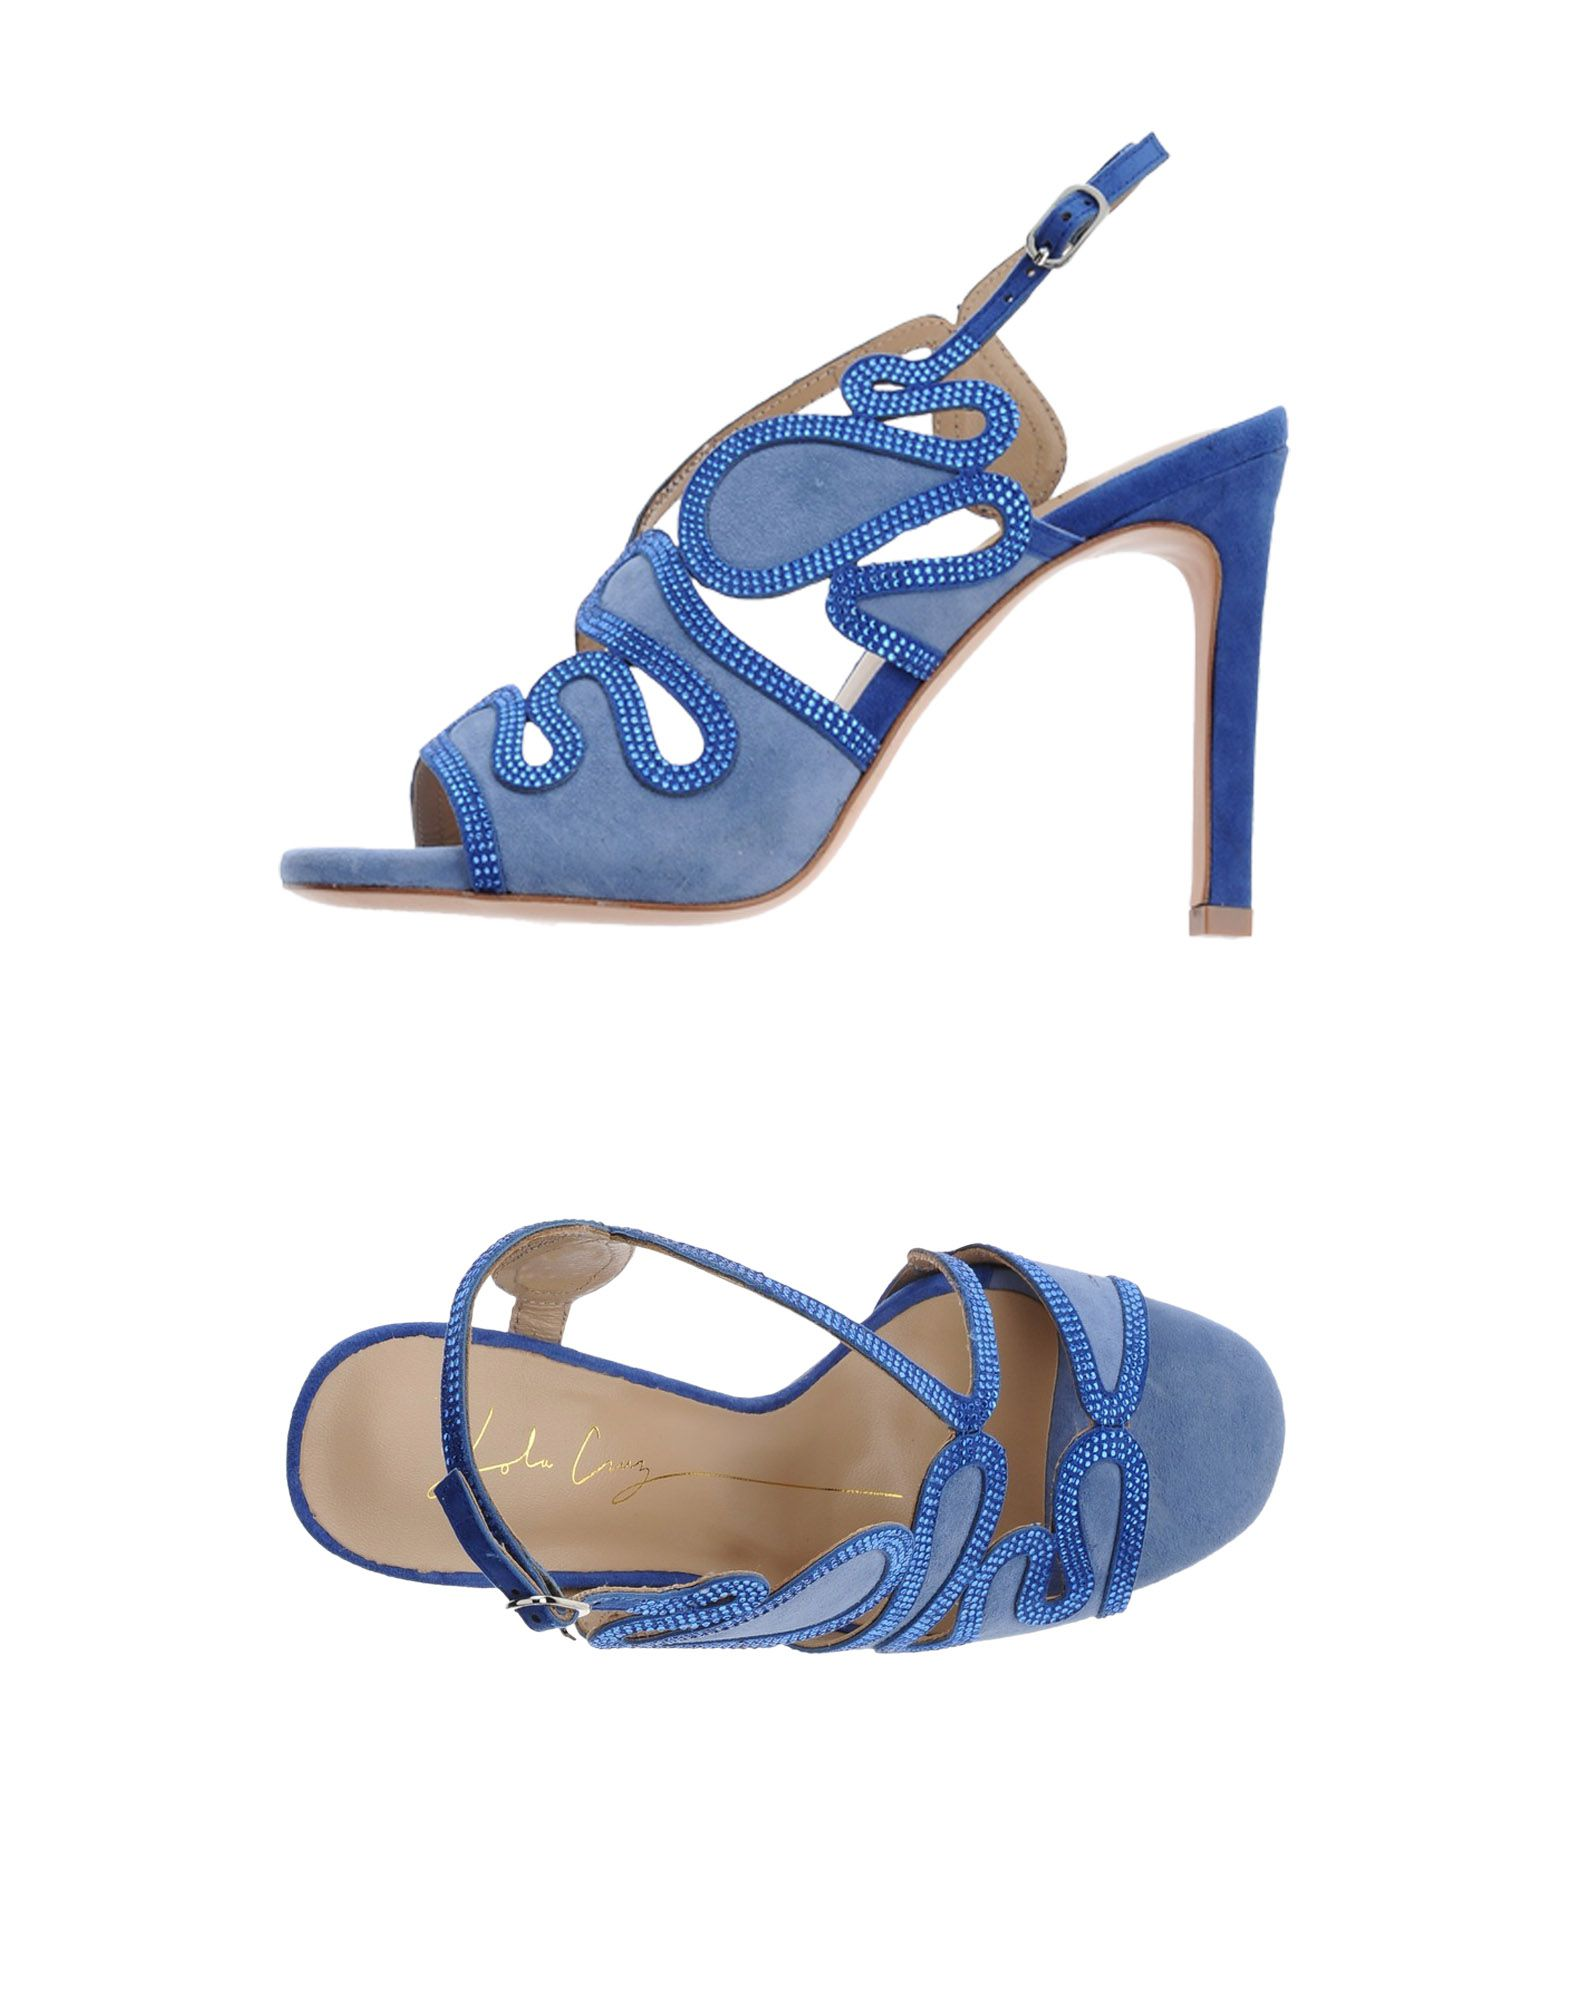 Lola Cruz Sandalen Damen  11345277DR Gute Qualität beliebte Schuhe